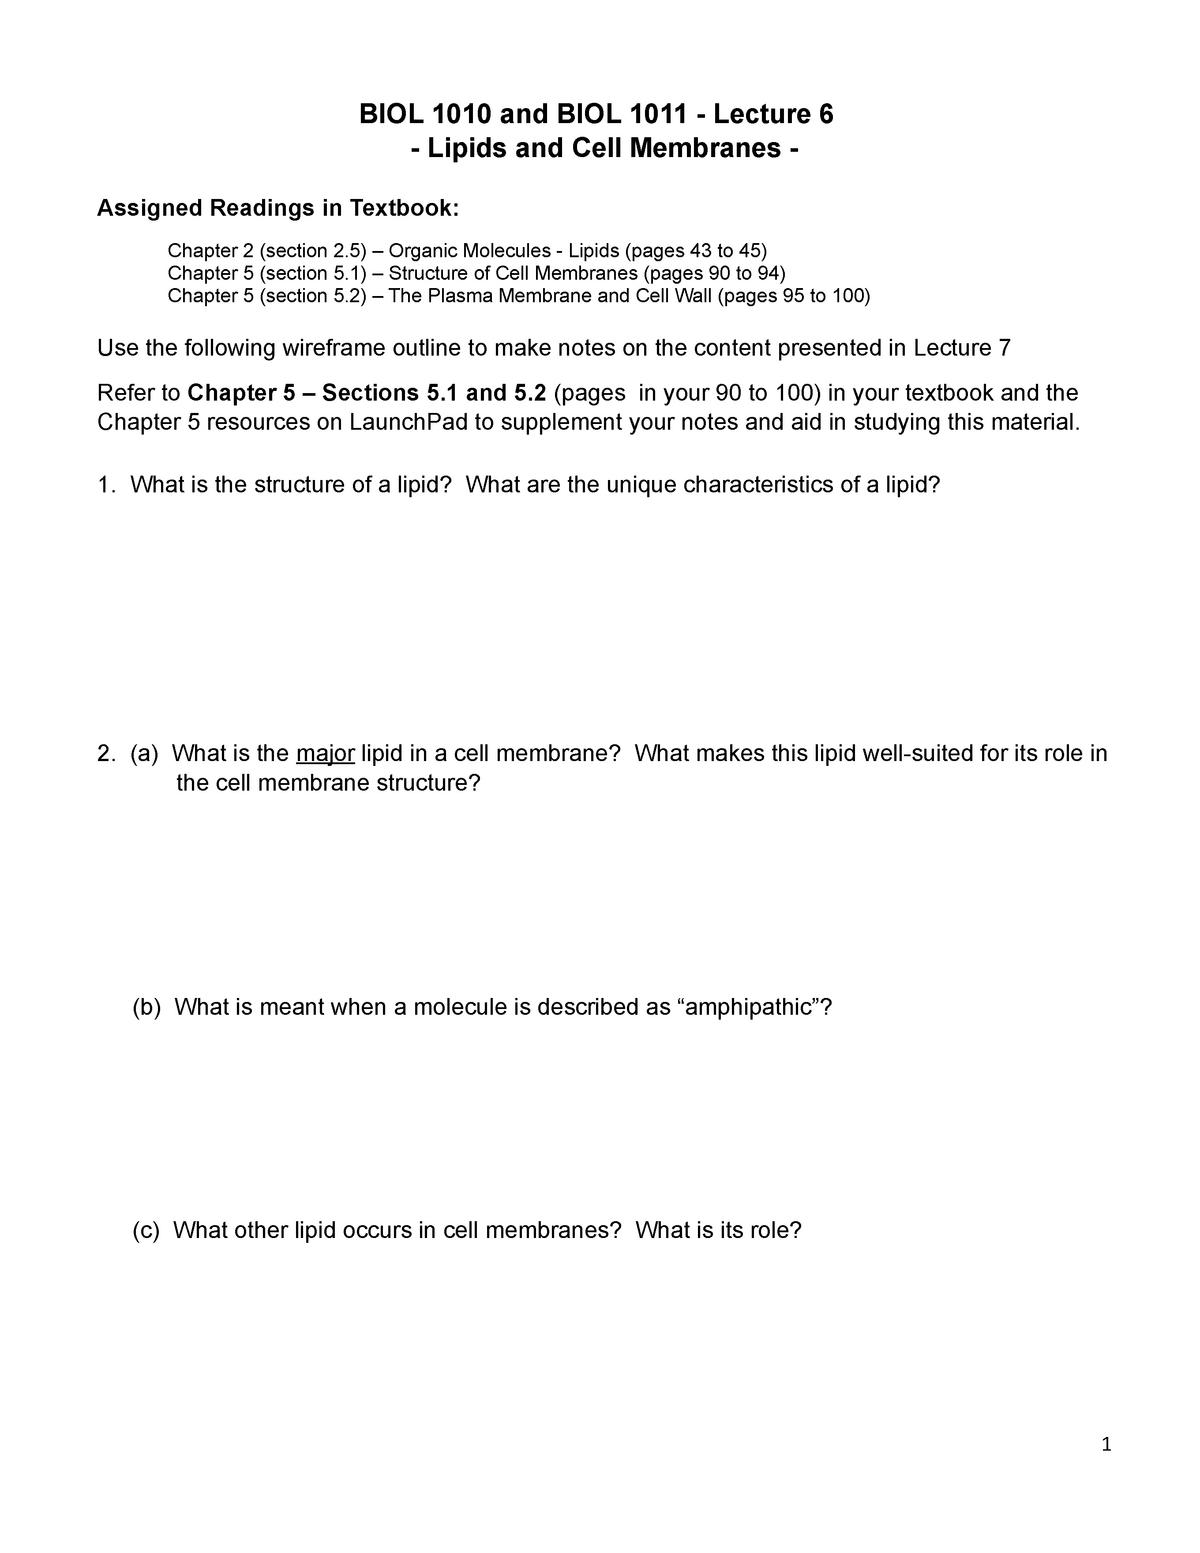 BIOL1010-1011-L6-Lipids and Membranes-WF - MEFB 460: Math